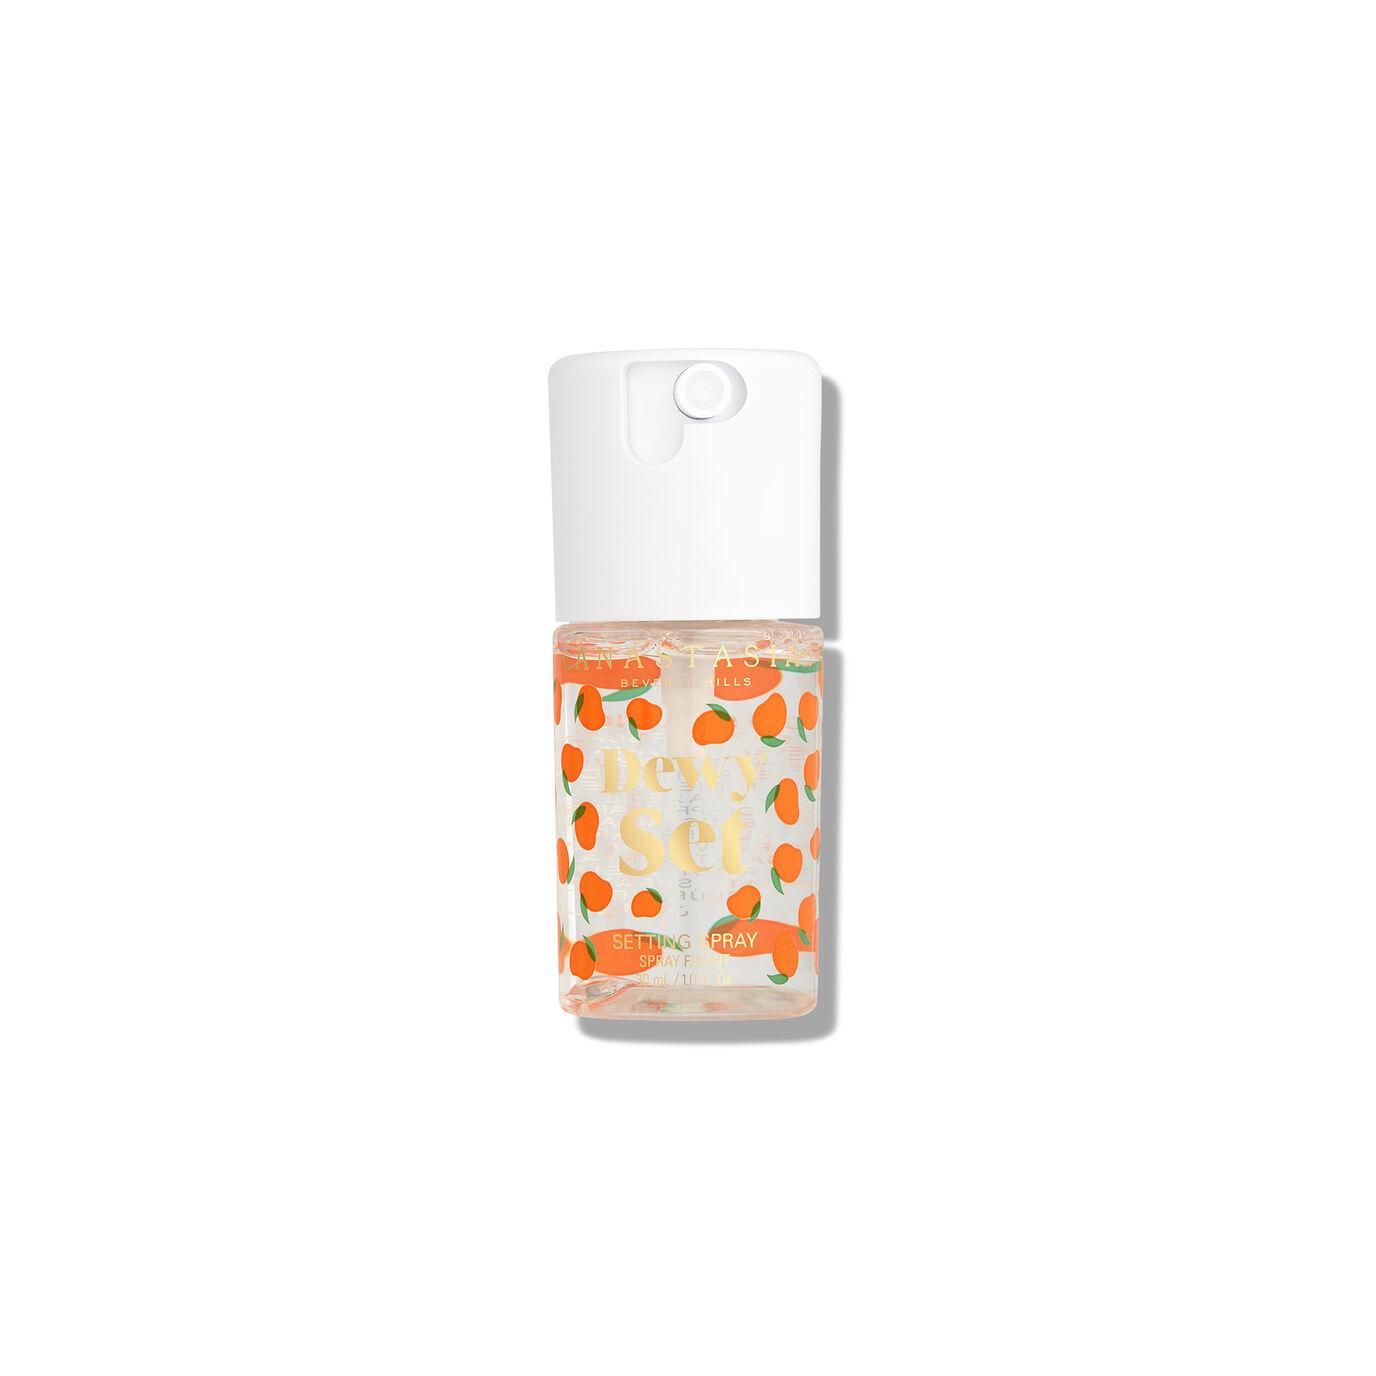 Mini Dewy Set Setting Spray - Mango